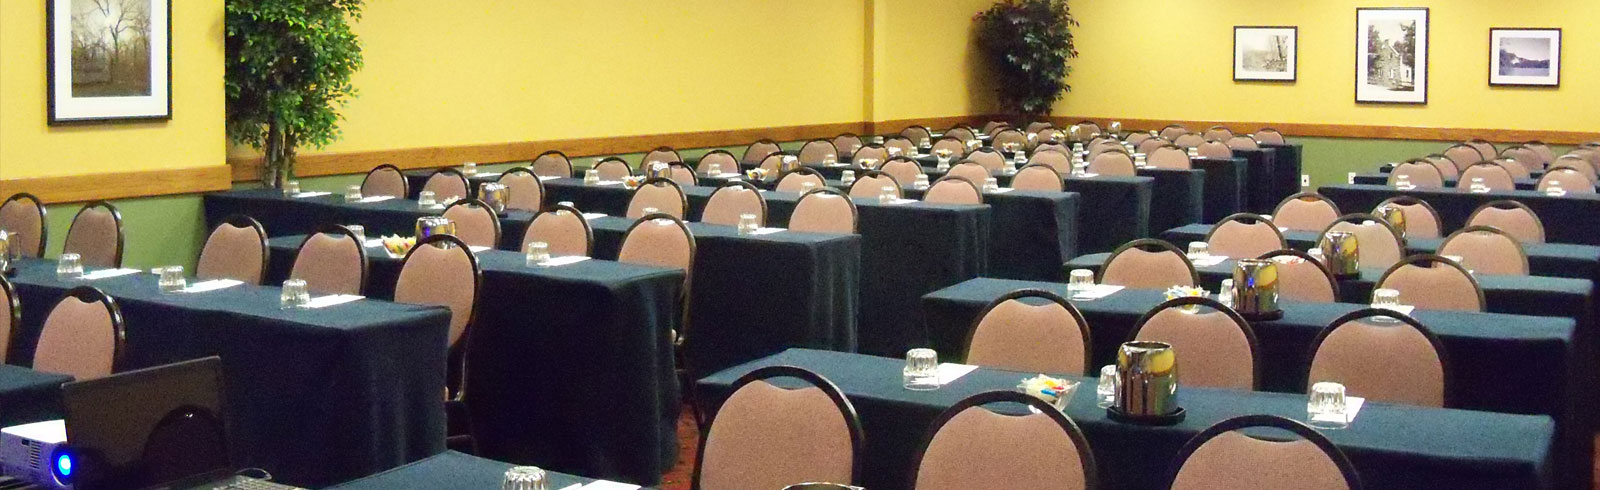 Meetings in Tan-Tar-A Resort, Osage Beach